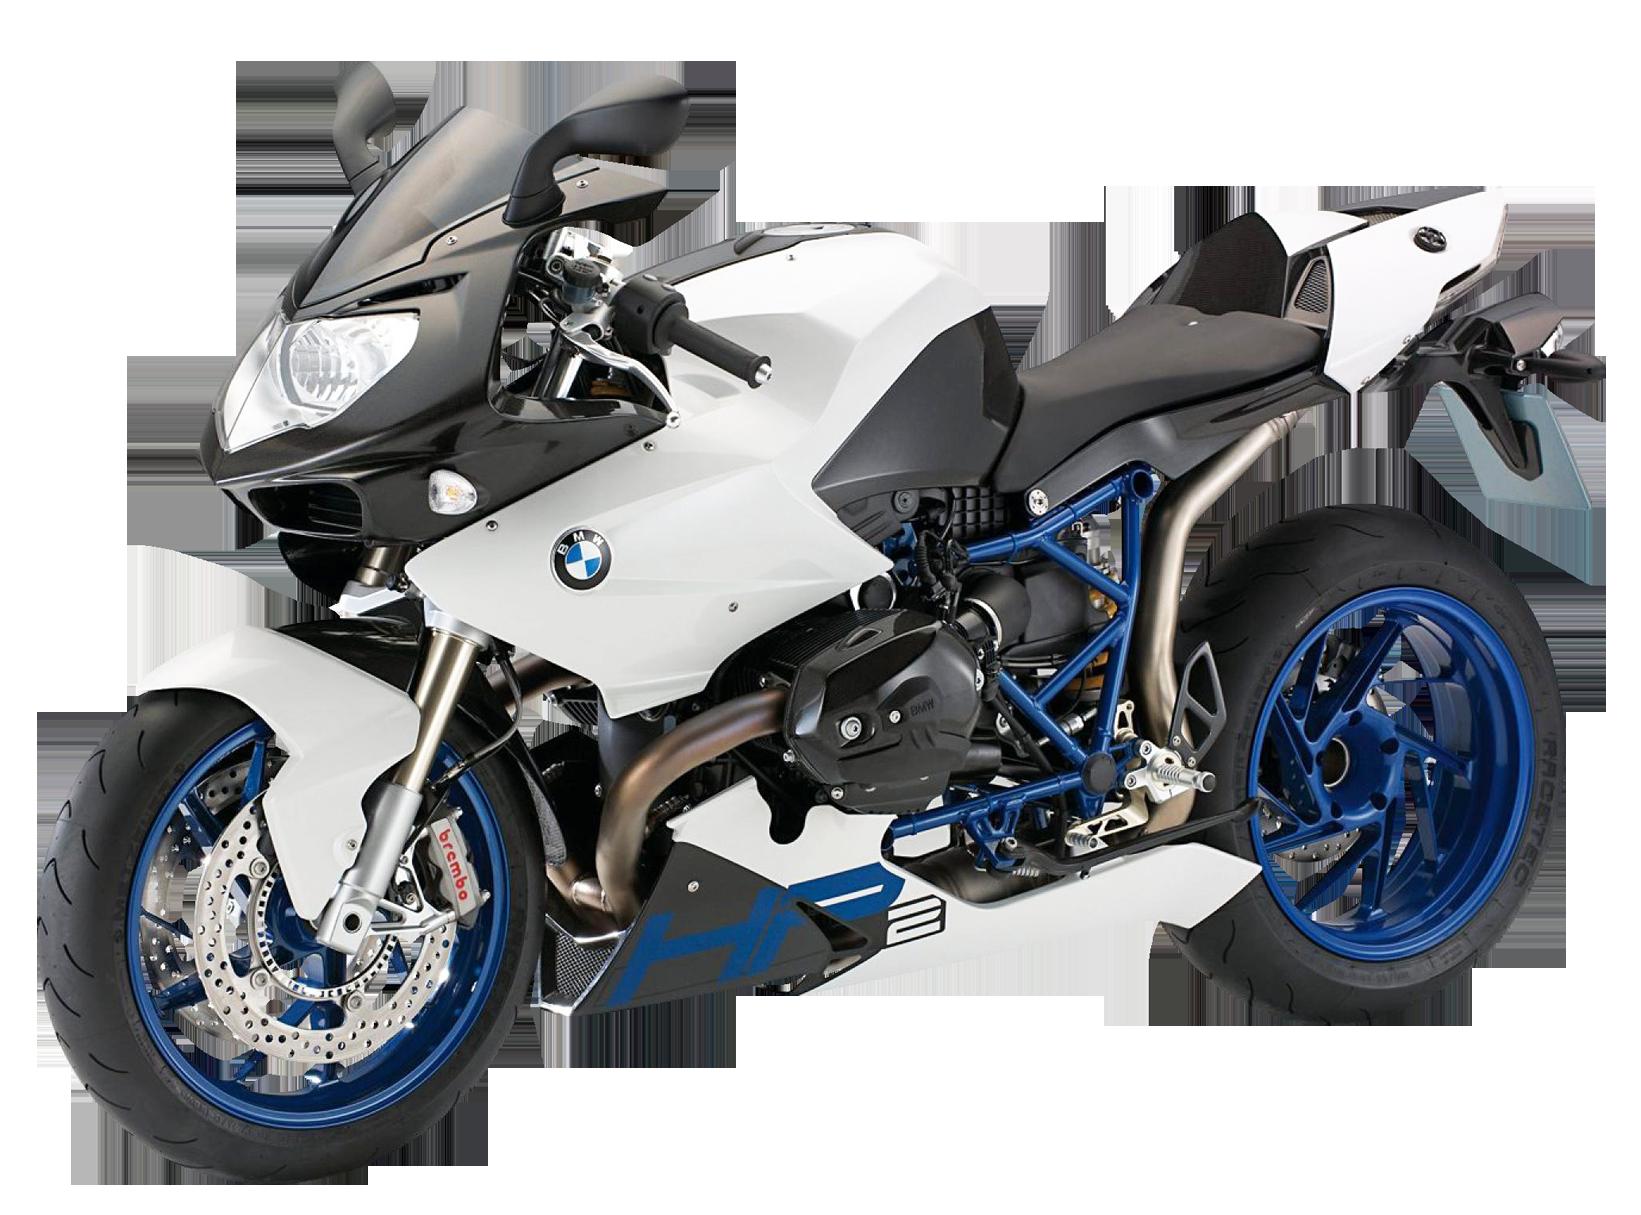 BMW Motorcycle PNG Image